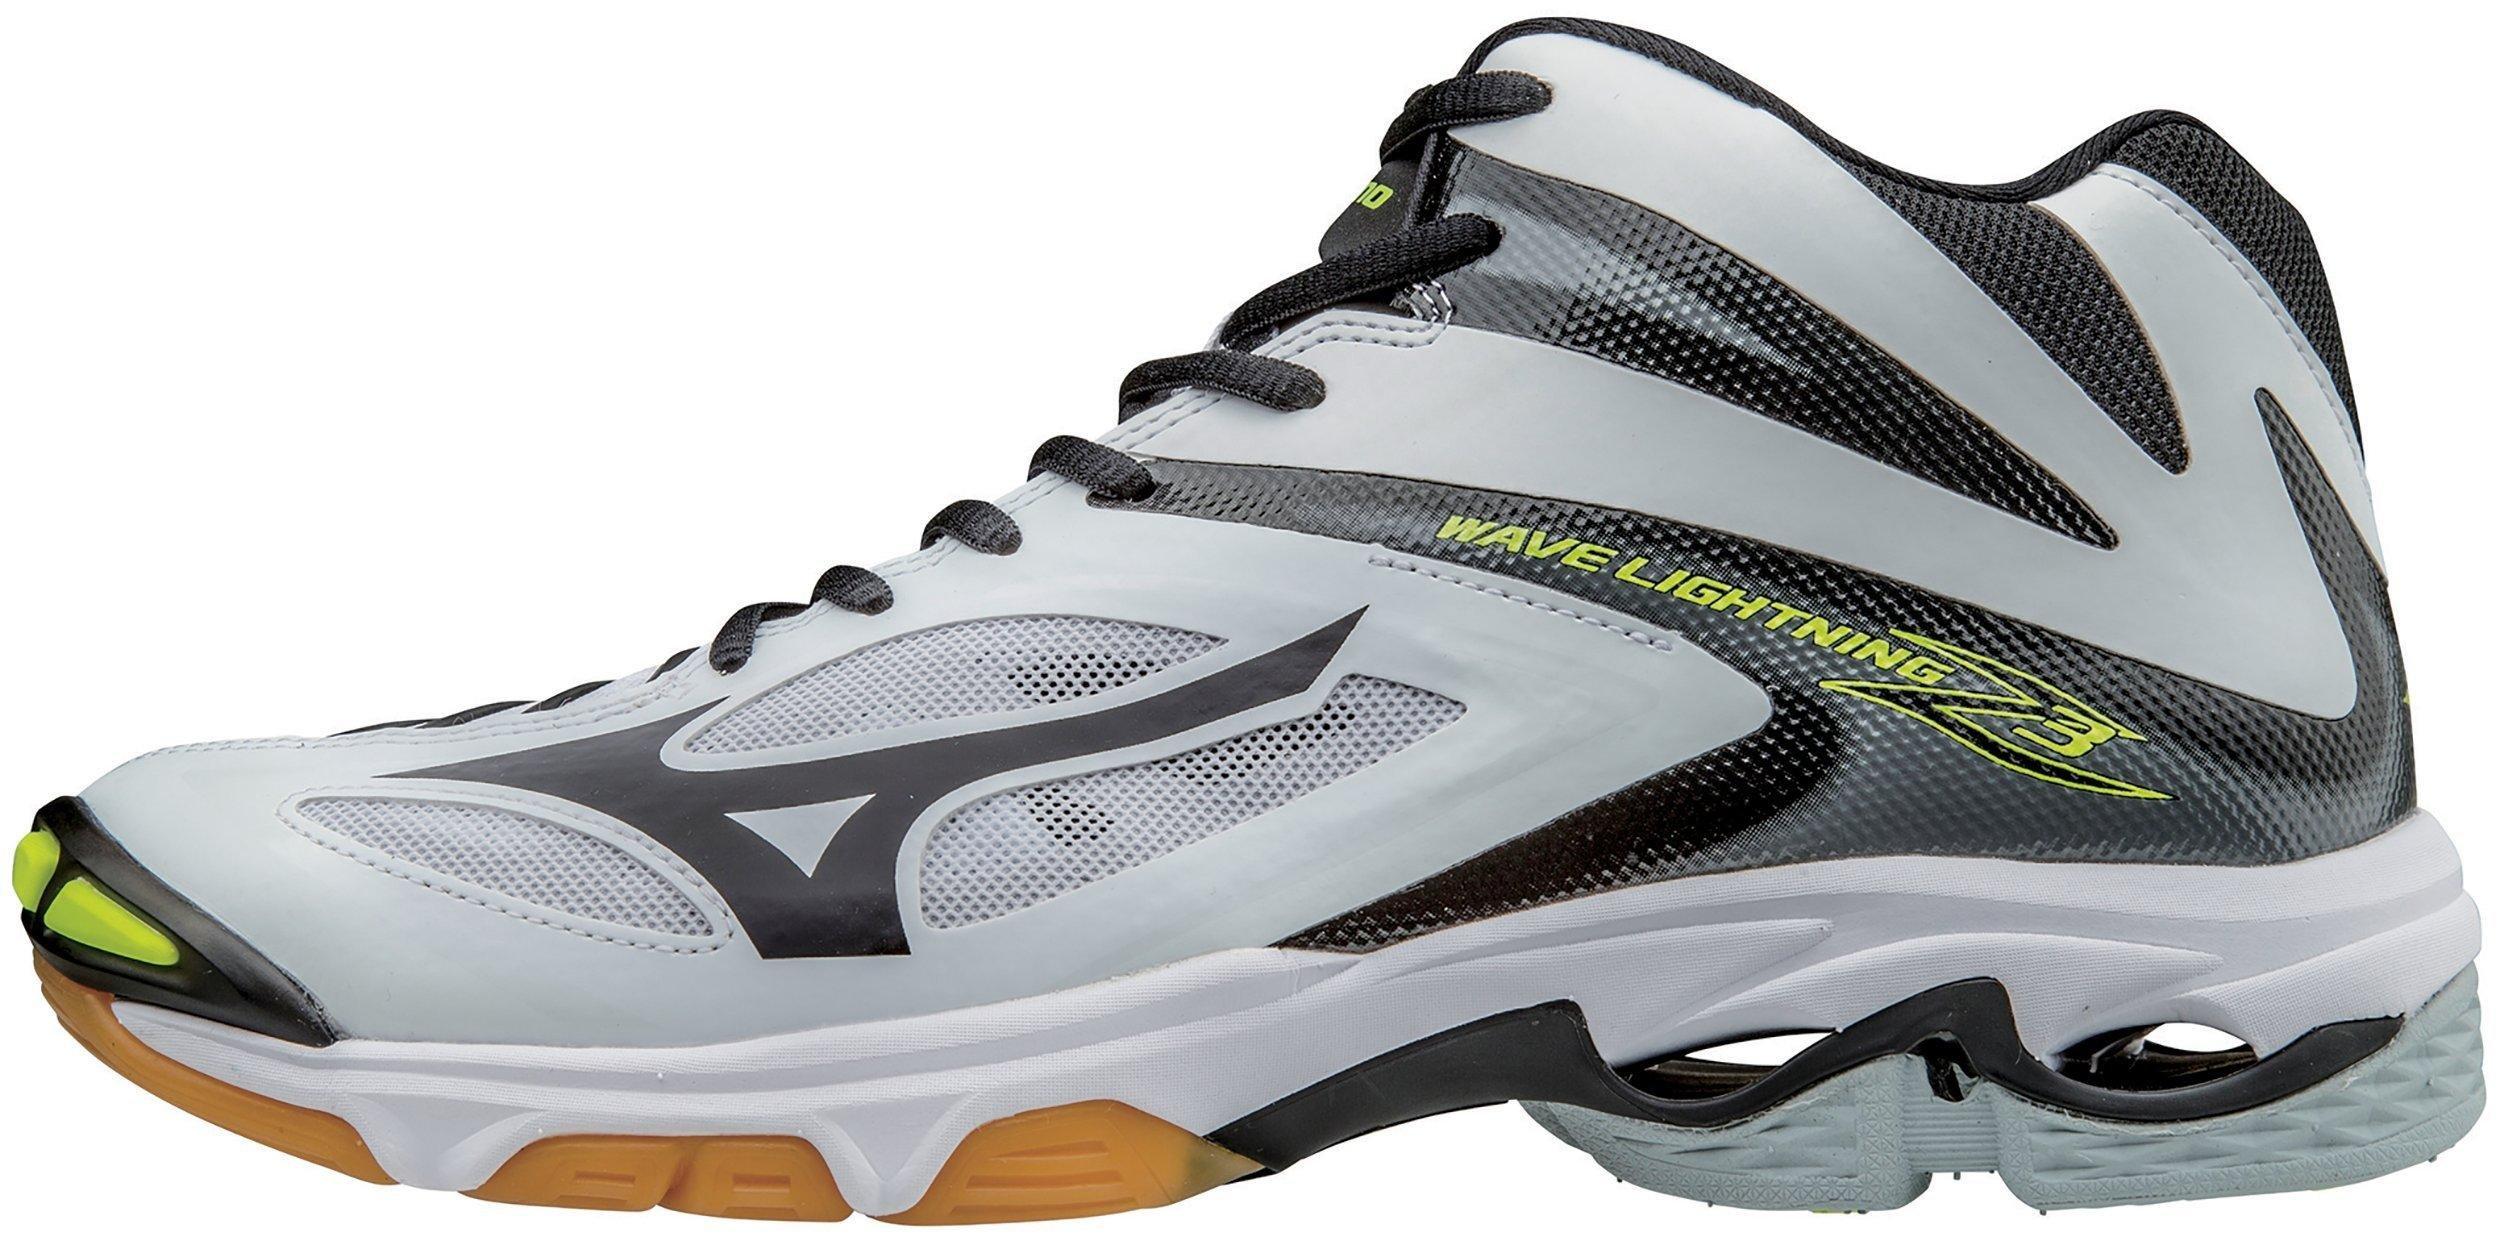 Mizuno Men's Wave Lightning Z3 Mid Volleyball Shoe, White/Black, 16 D US